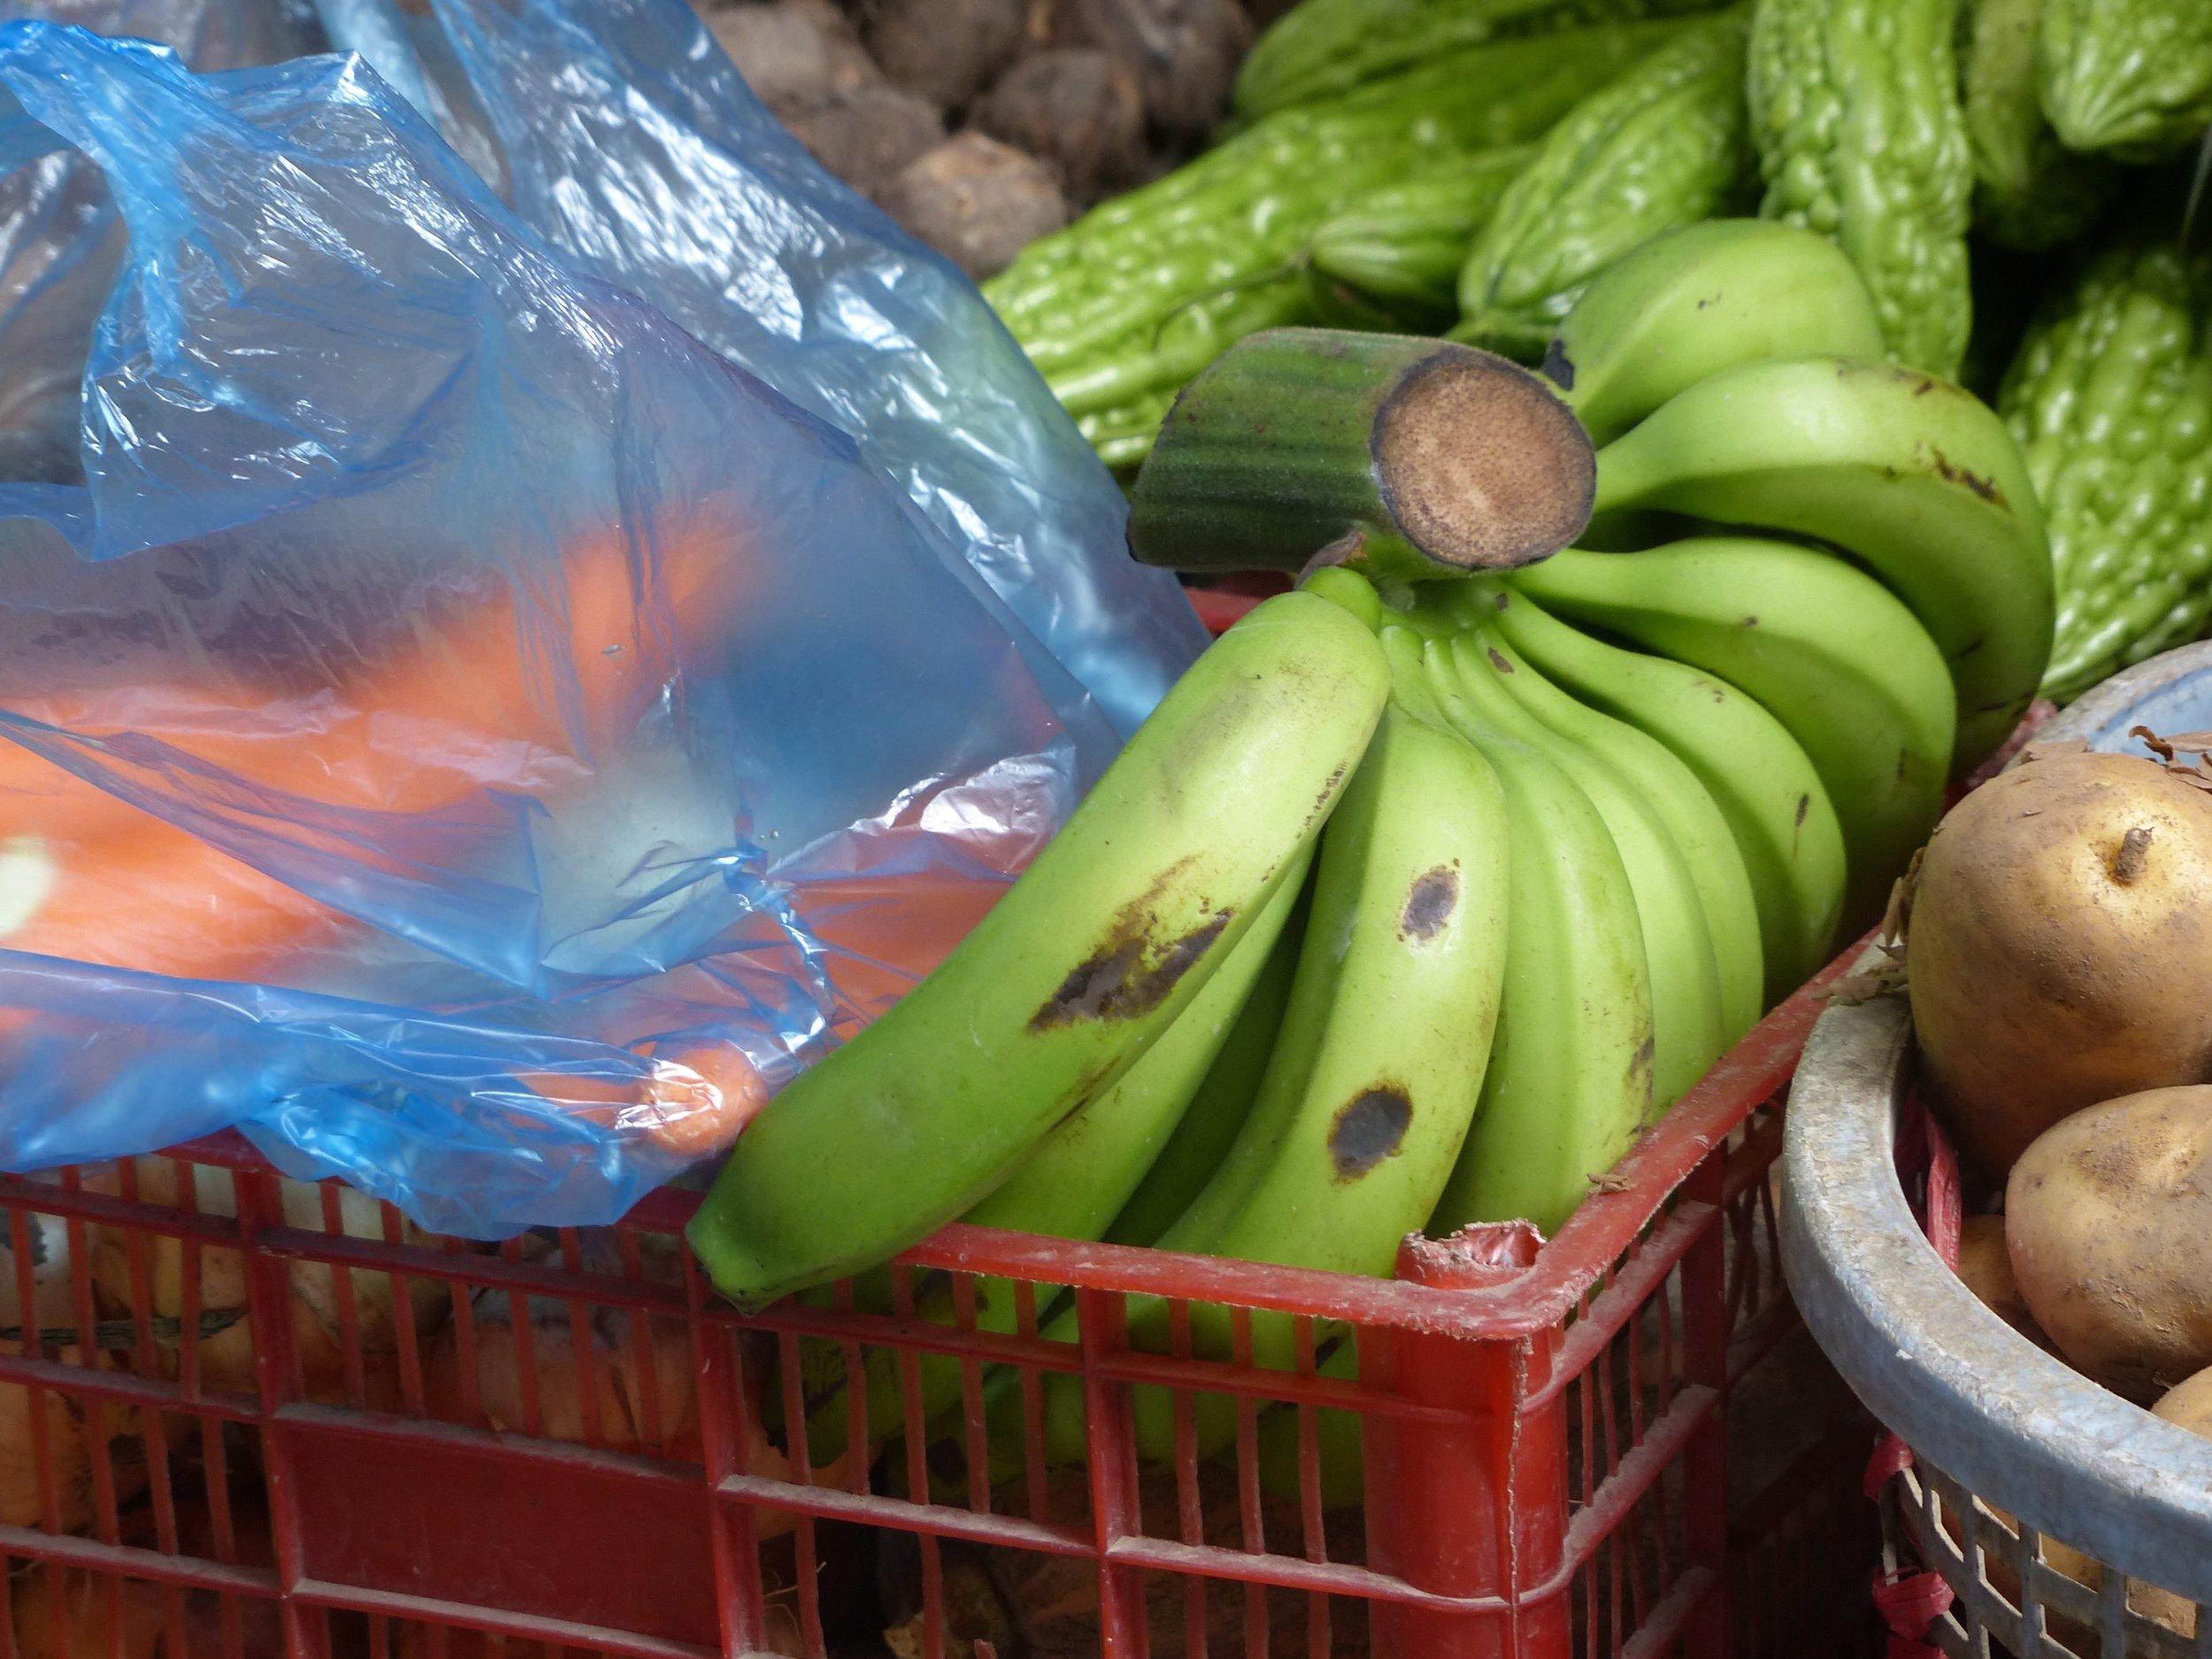 So THAT'S how bananas grow!